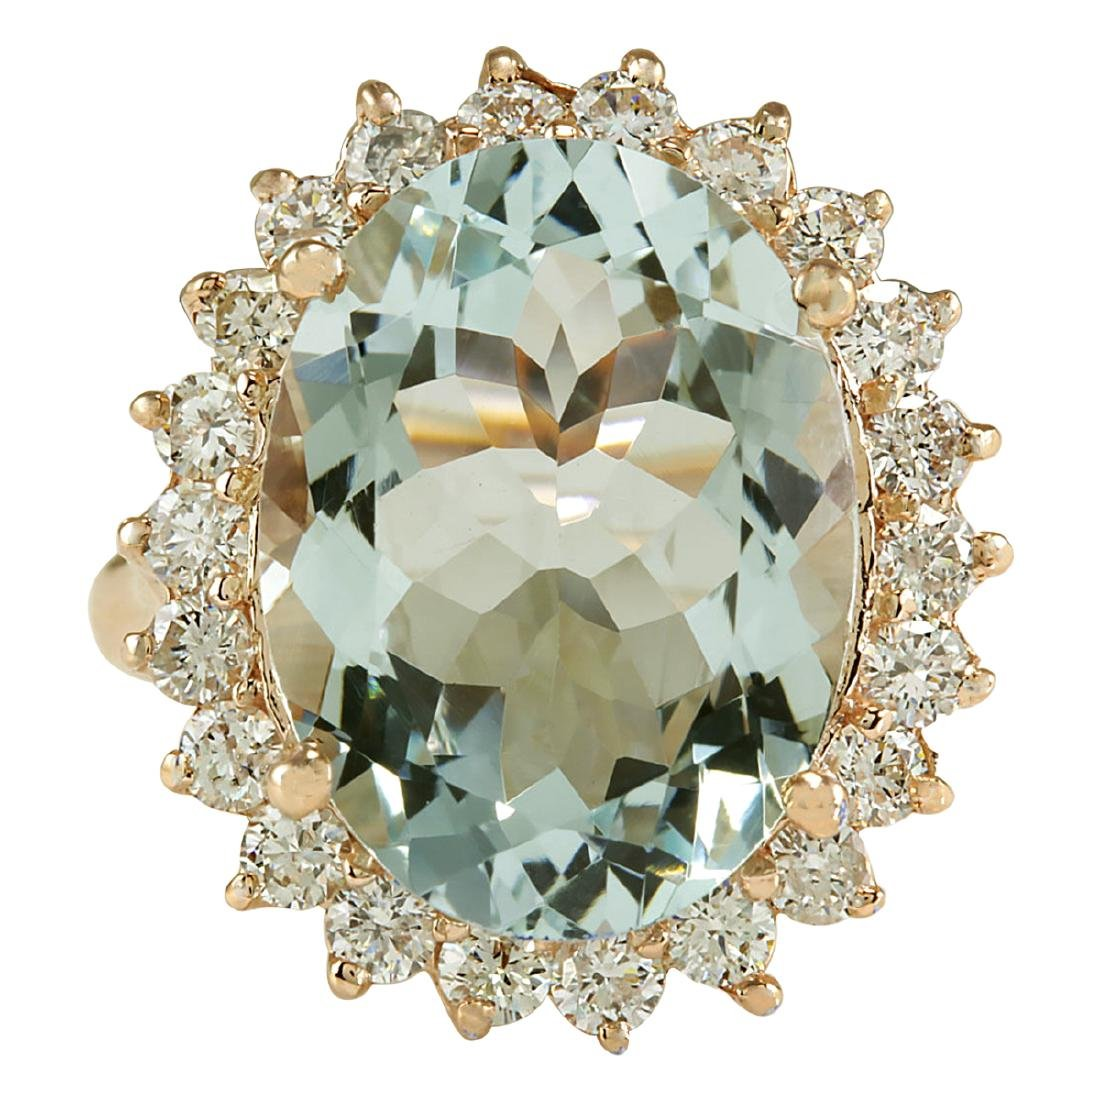 8.40CTW Natural Aquamarine And Diamond Ring In 18K